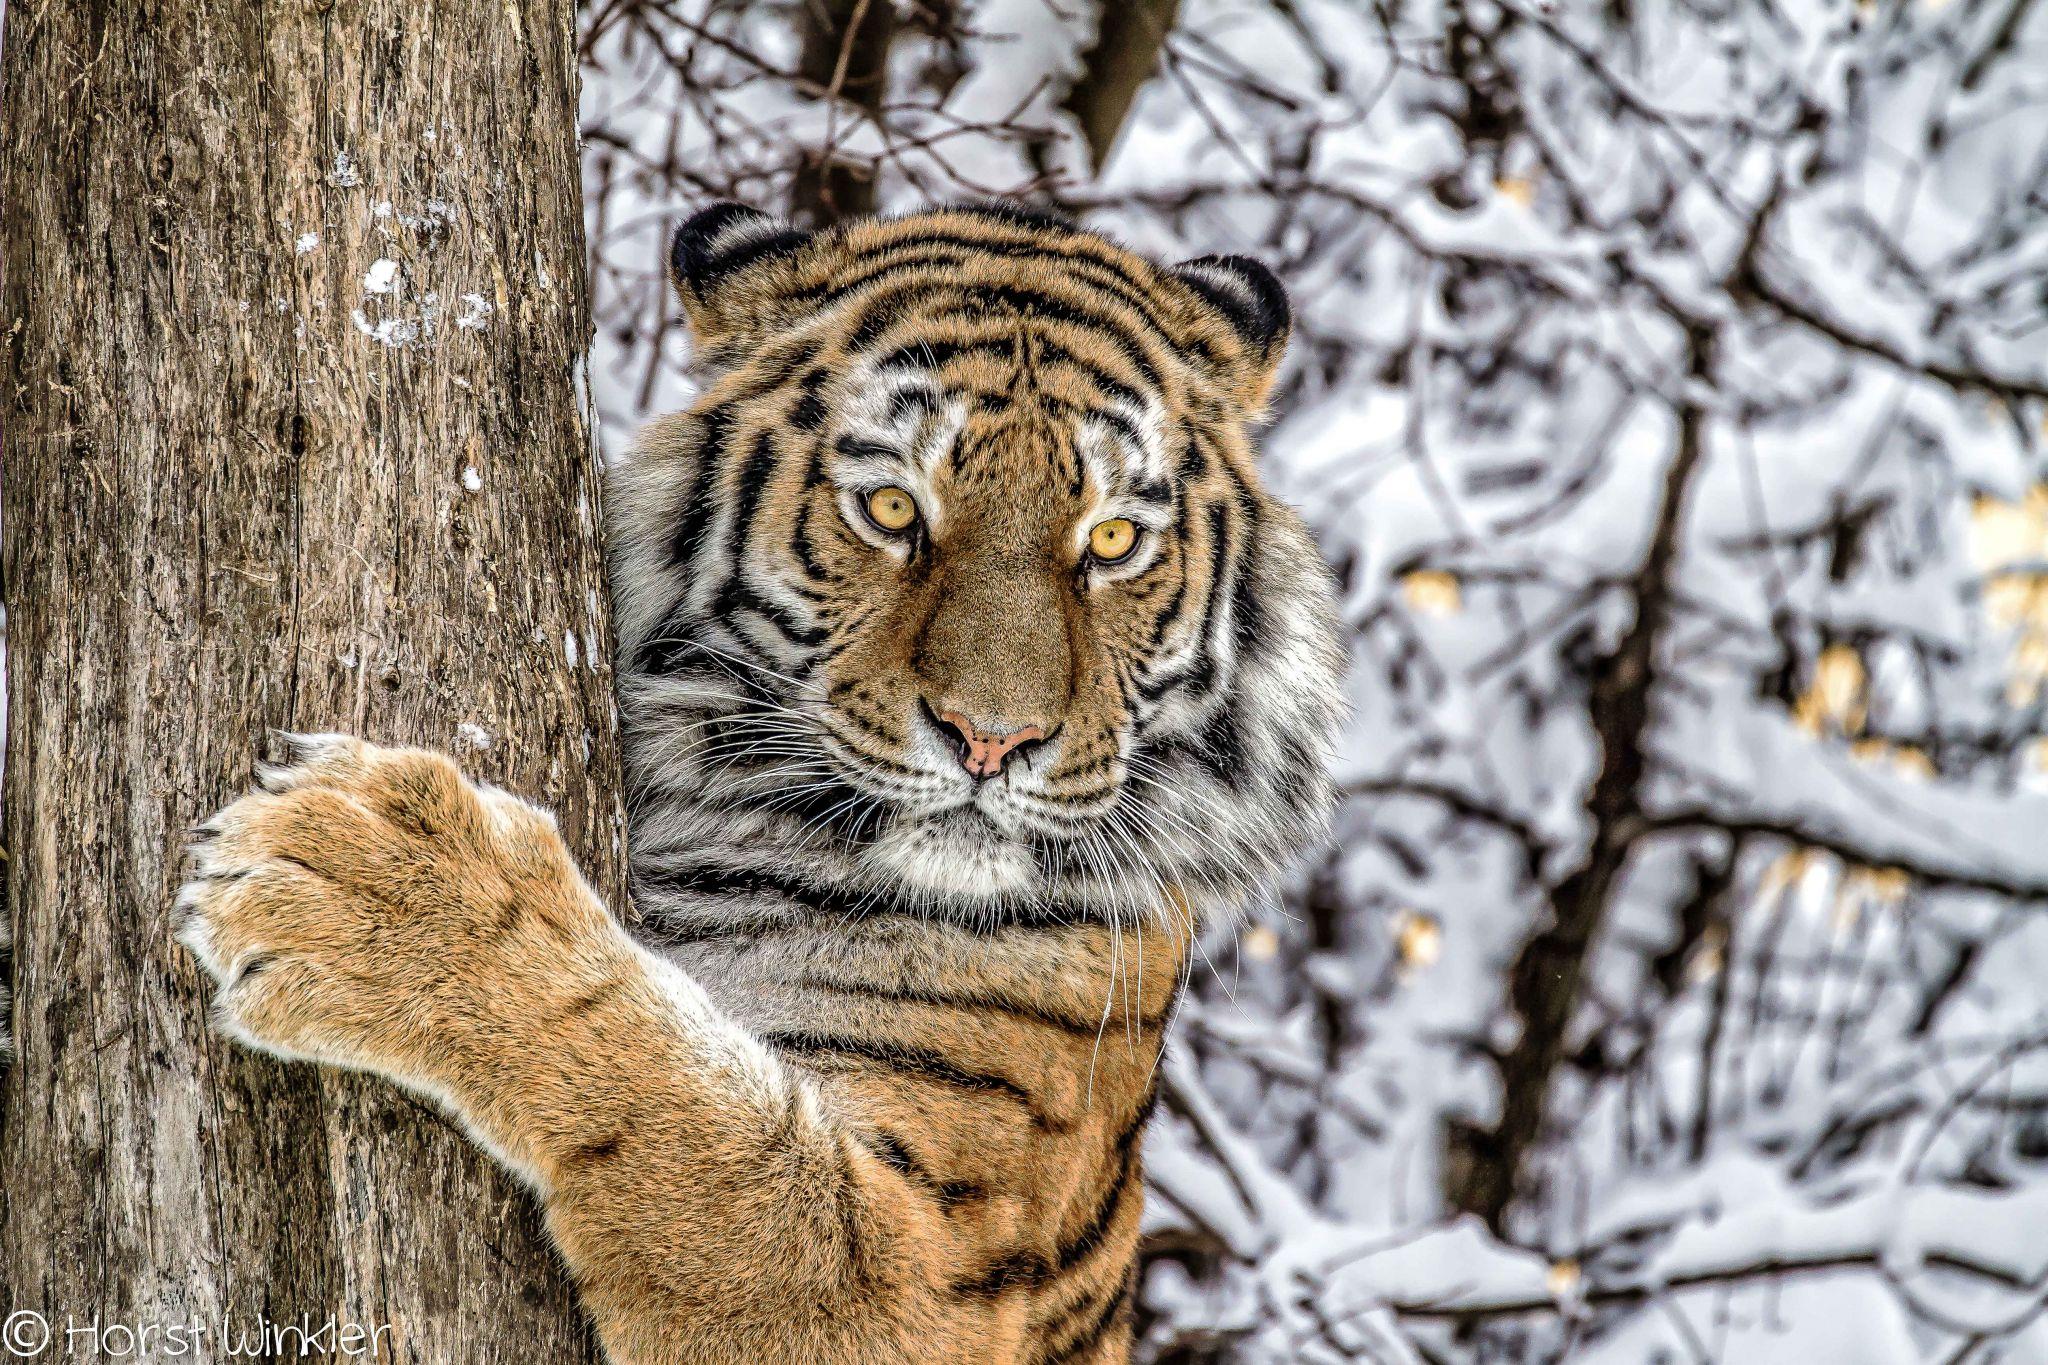 Tiger At The Tree, Austria